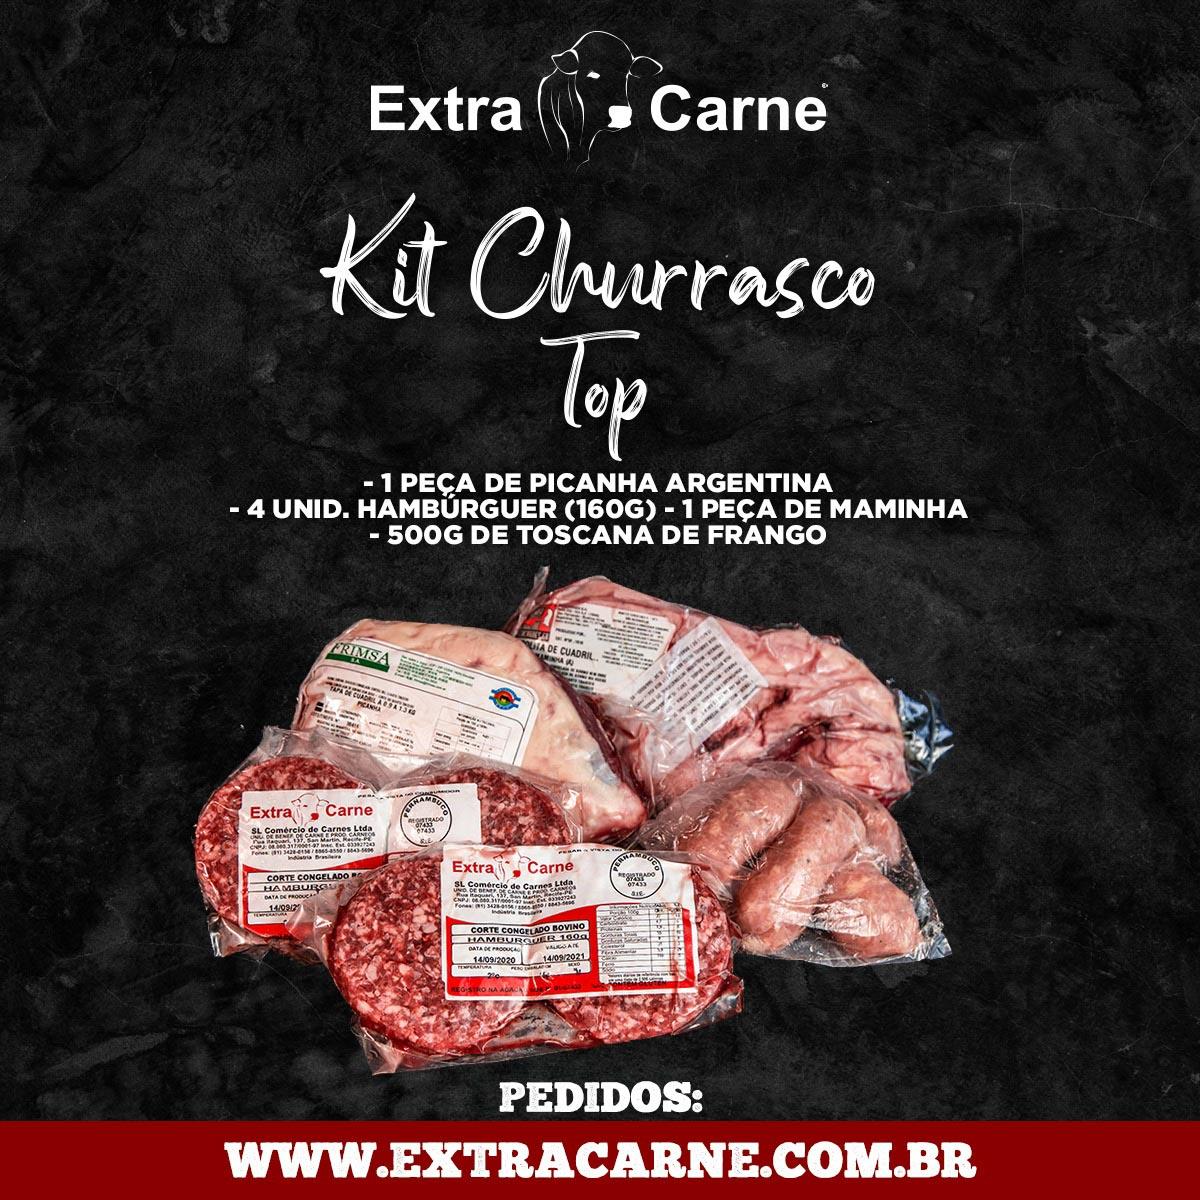 KIT CHURRASCO TOP